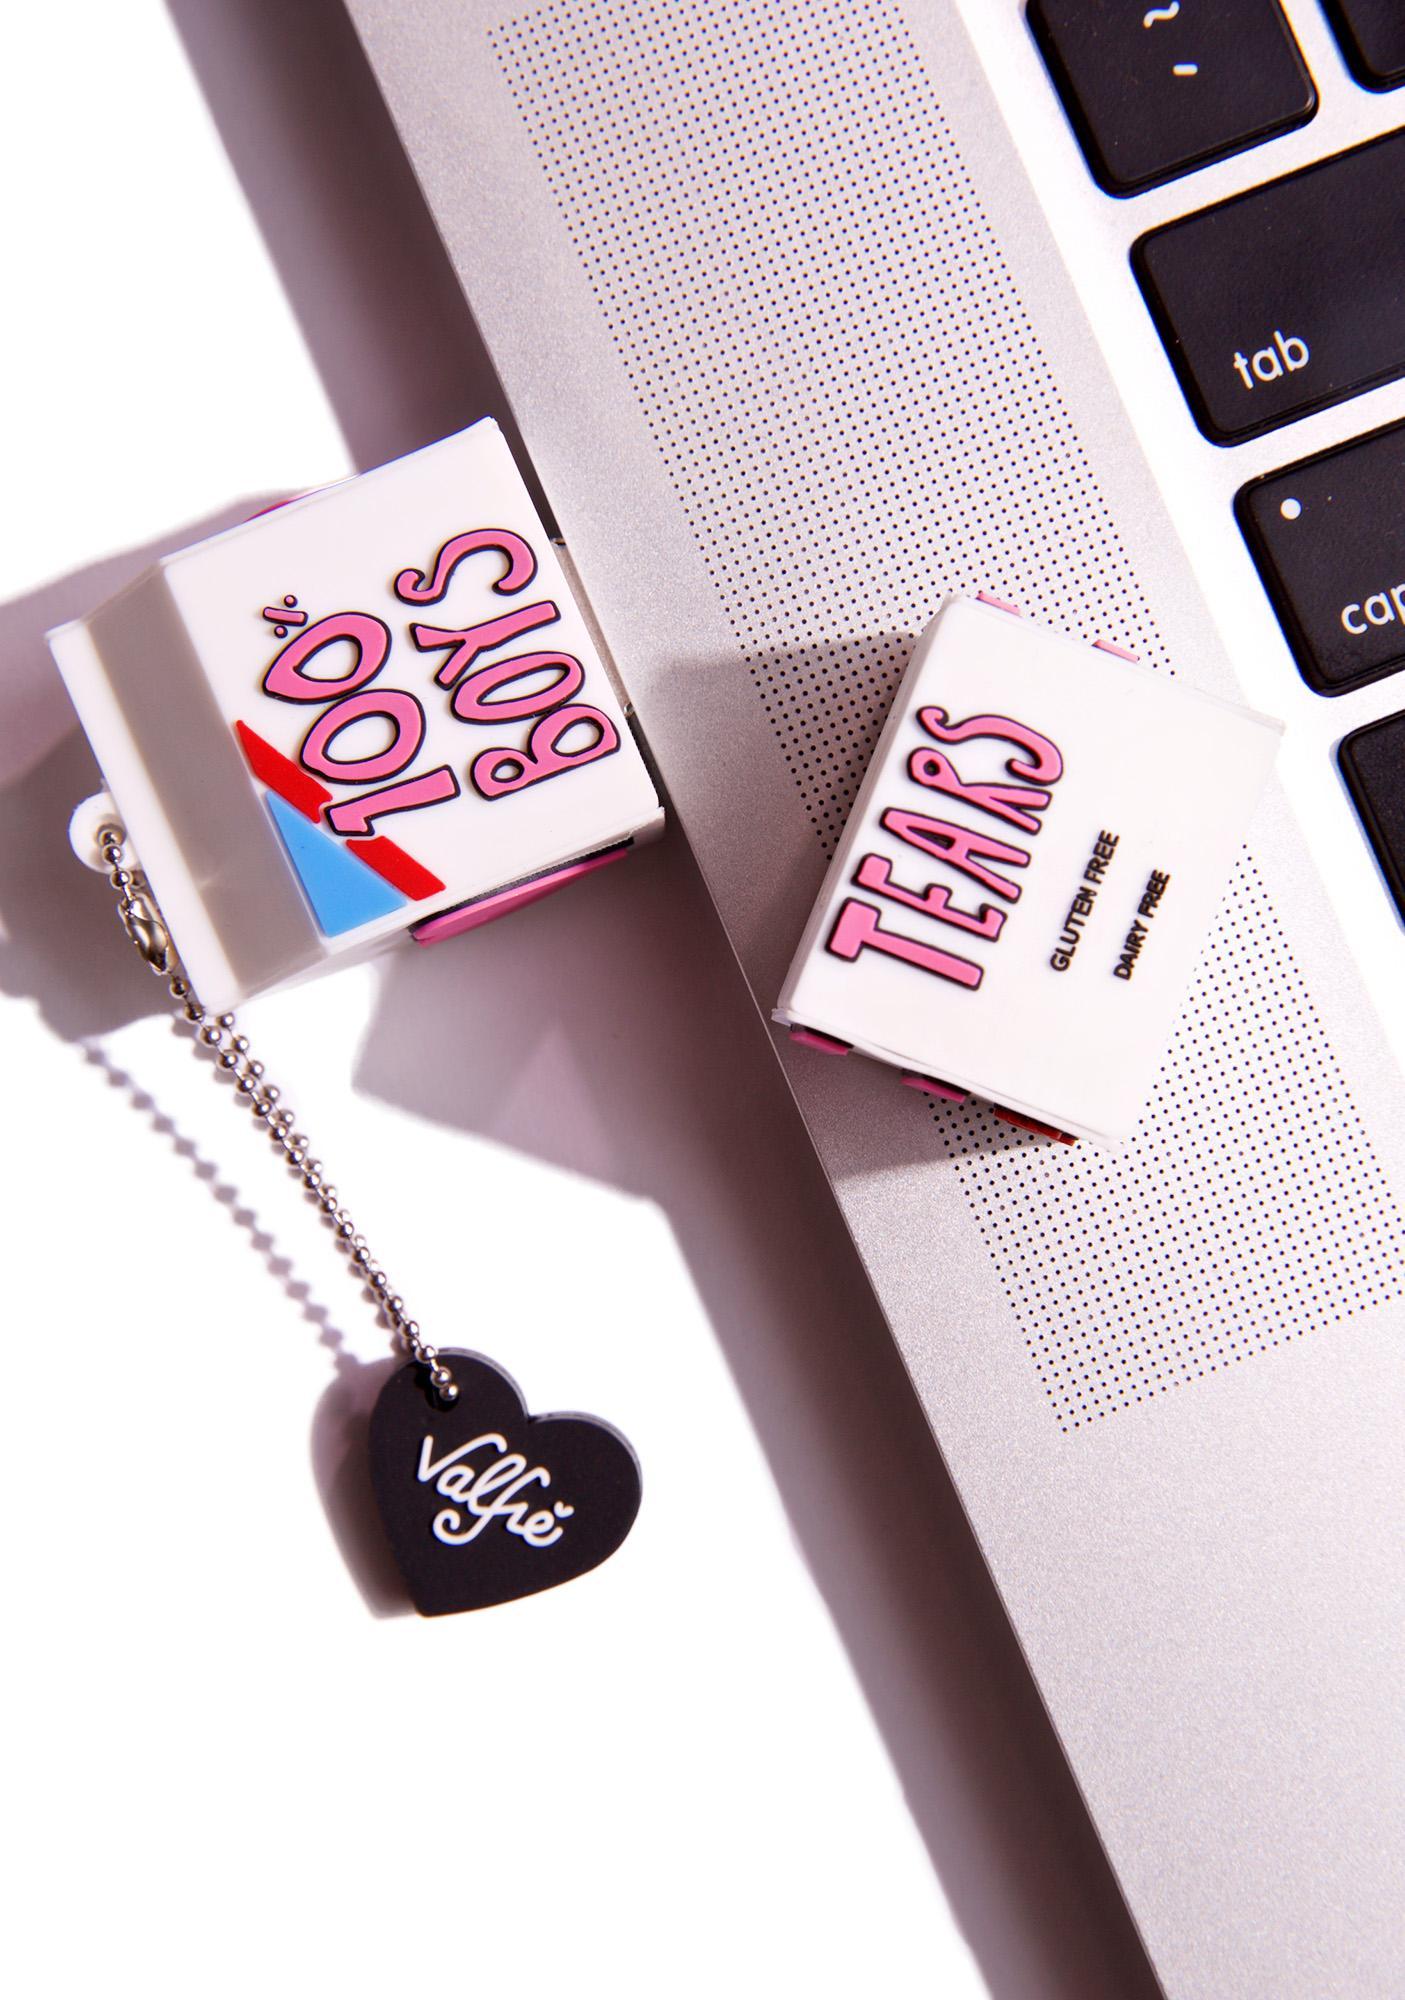 Valfré Boys Tears 16GB USB Drive